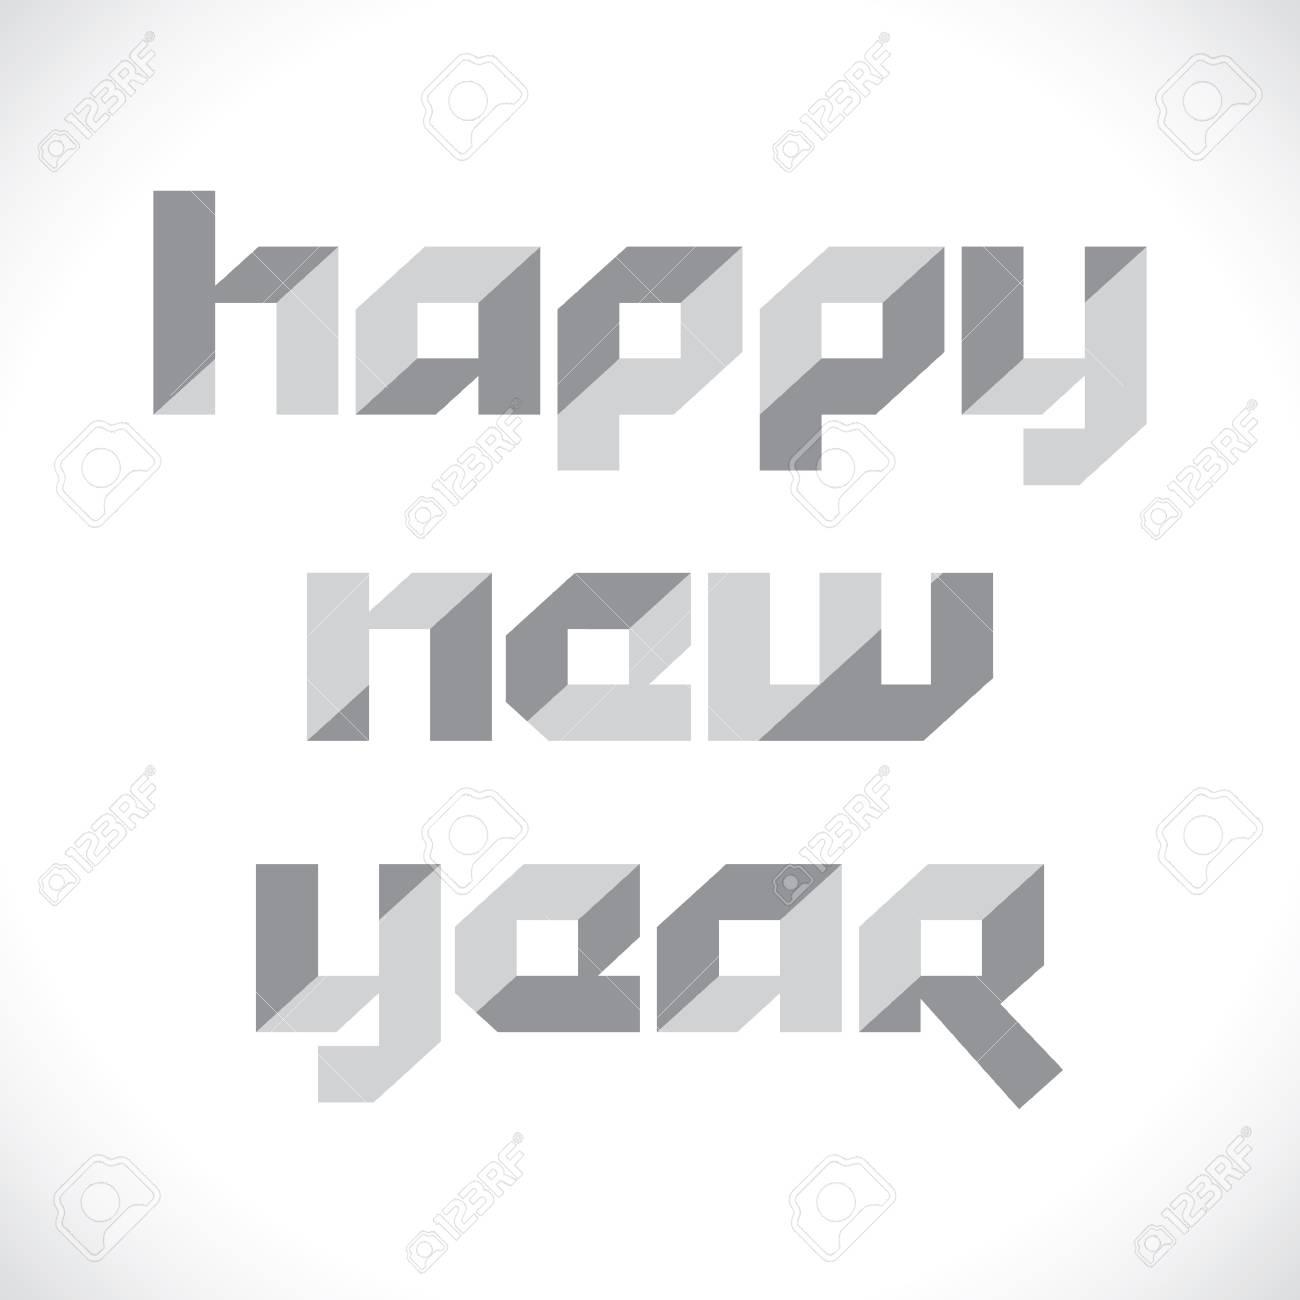 new year stock vector Stock Vector - 16845712